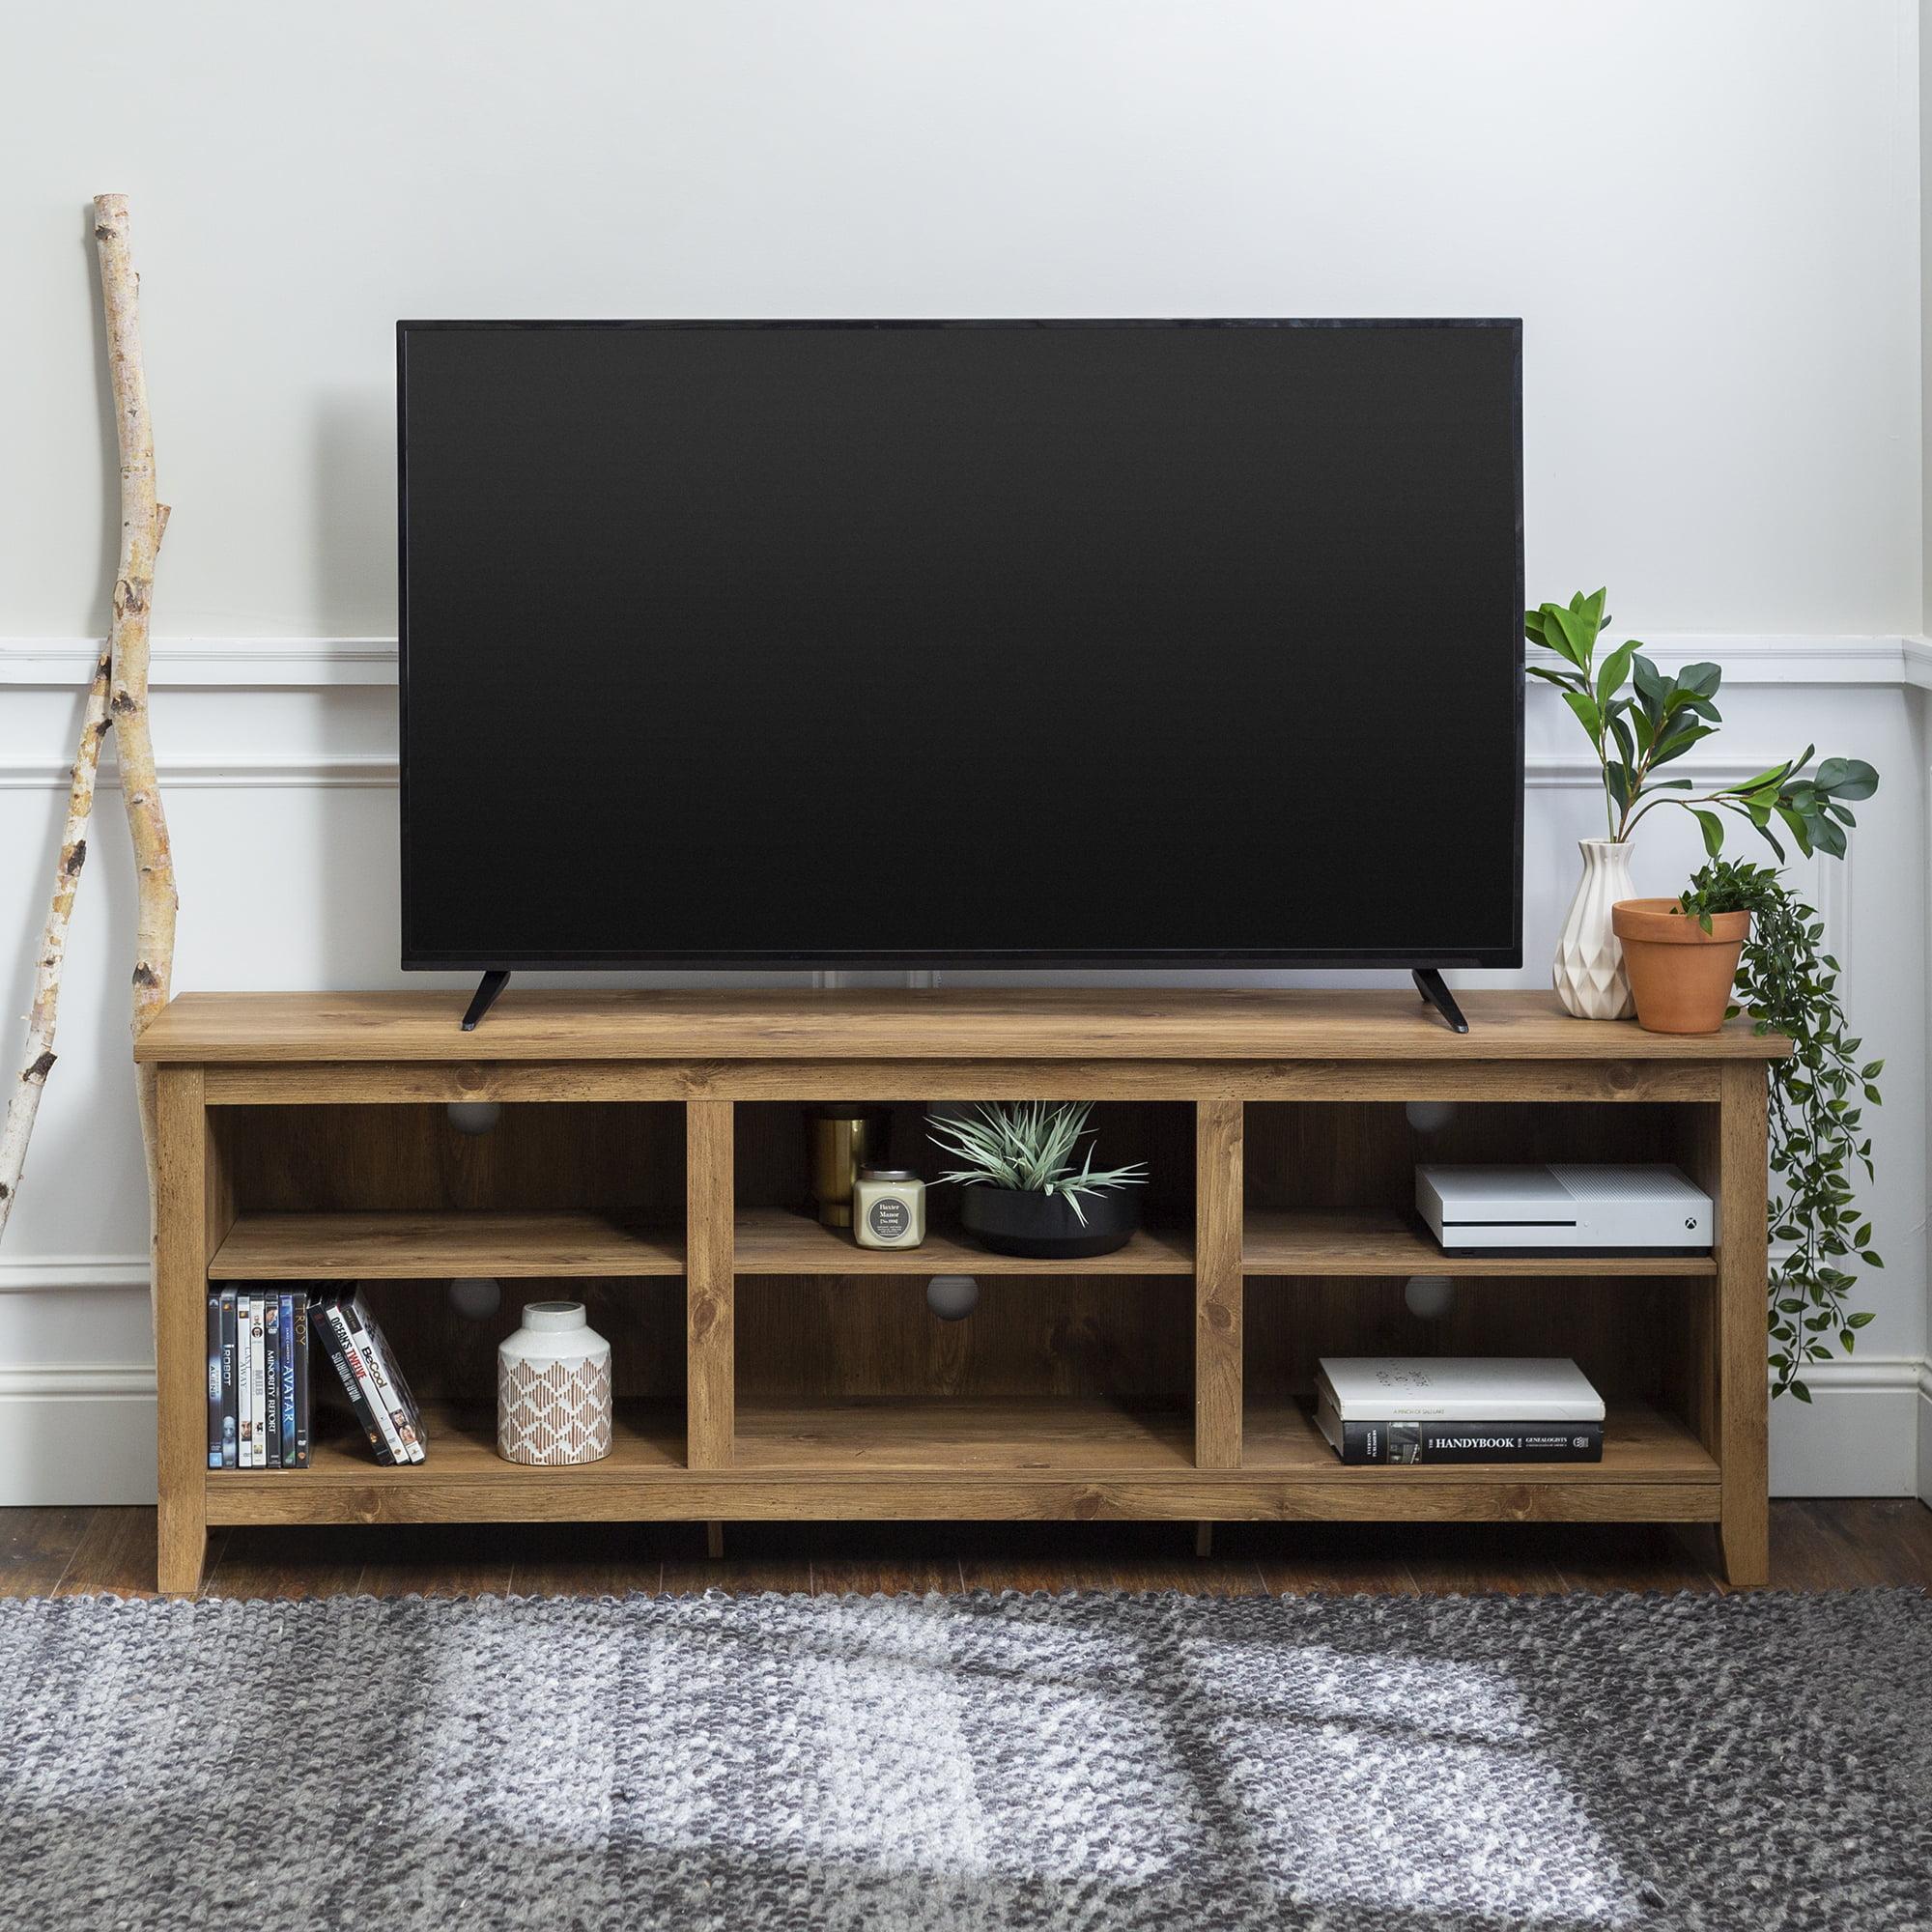 Manor Park Wood Tv Media Storage Stand For Tvs Up To 78 White Wash Walmart Com Walmart Com